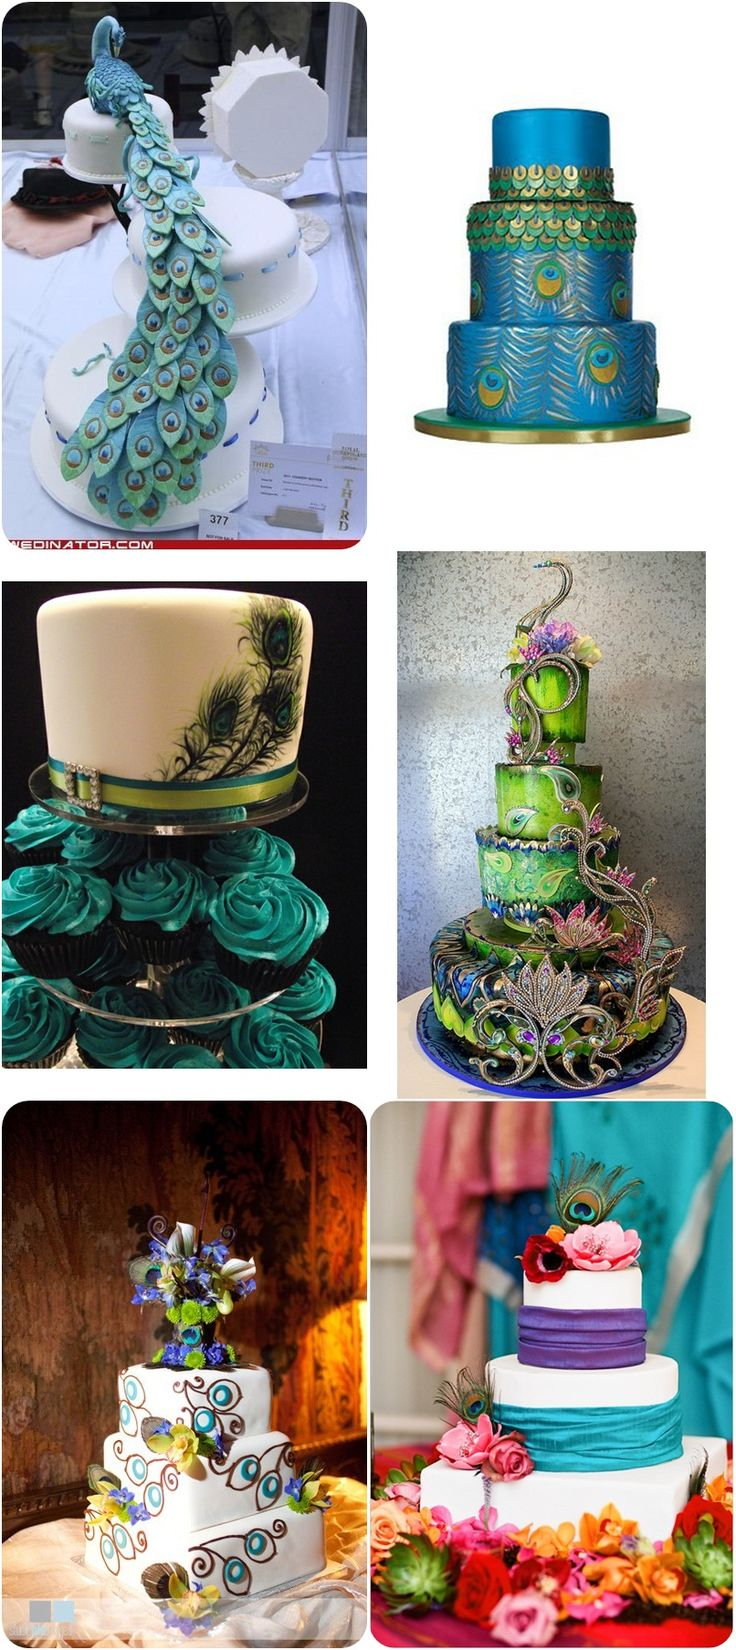 wild peacock cakes #weddingcakes #weddinginpiration #peacockwedding